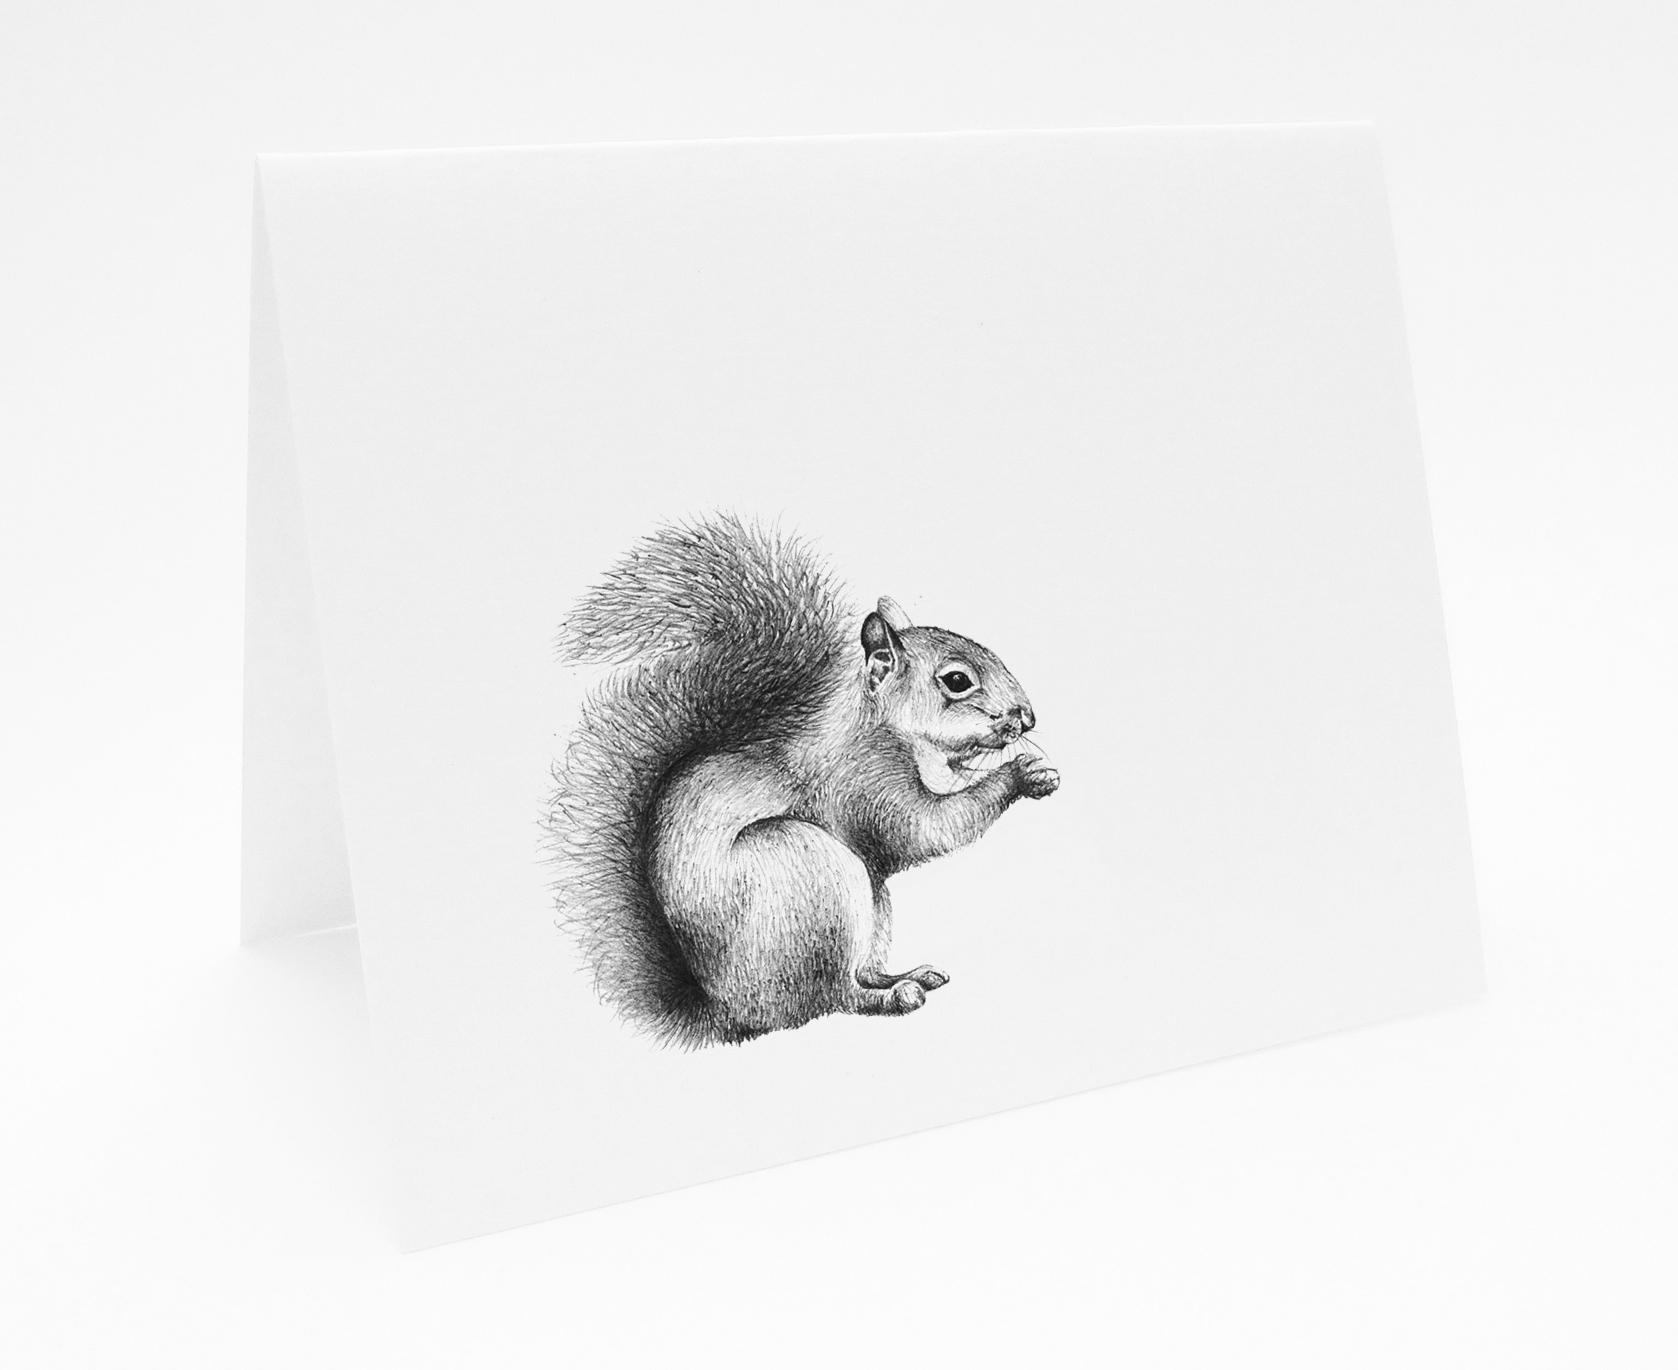 Squirrel - Landscape